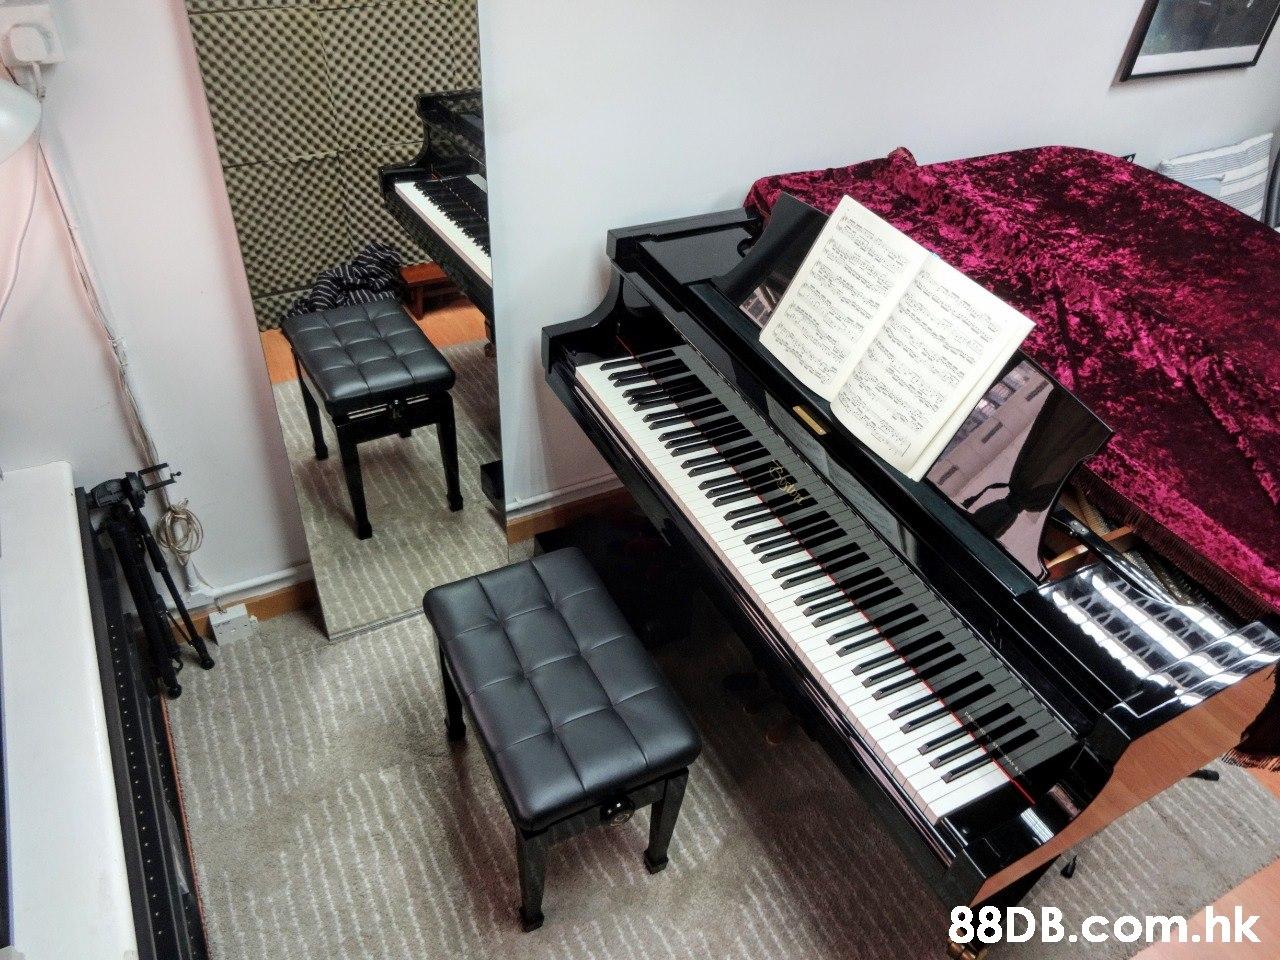 ww mmmo I FOL7 .hk  Piano,Musical instrument,Electronic instrument,Keyboard,Musical keyboard